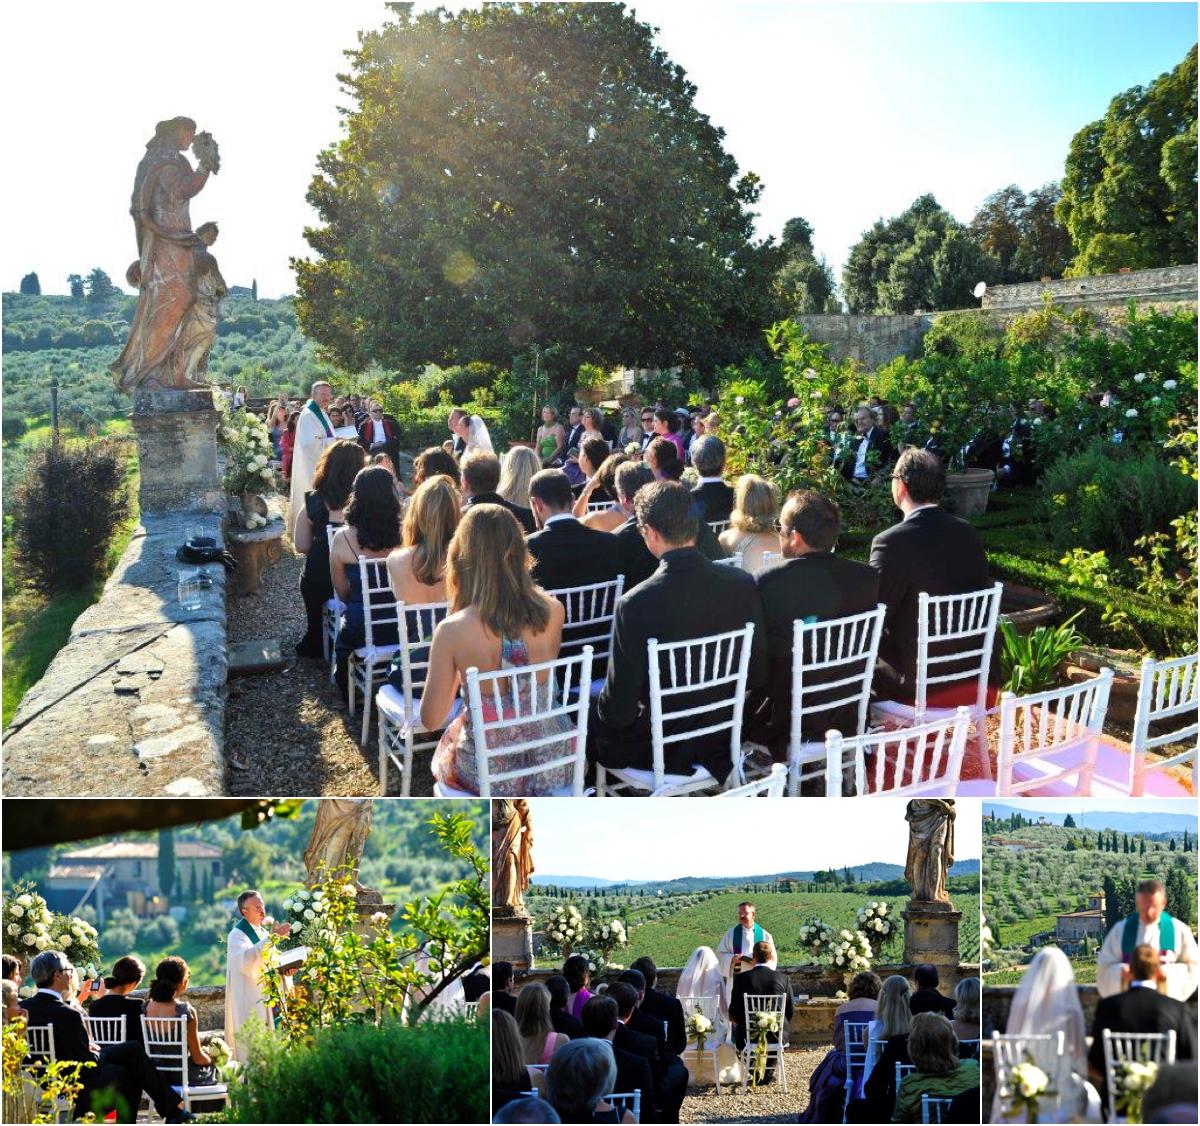 the_tuscany_wedding_blog_rappold_42.jpg